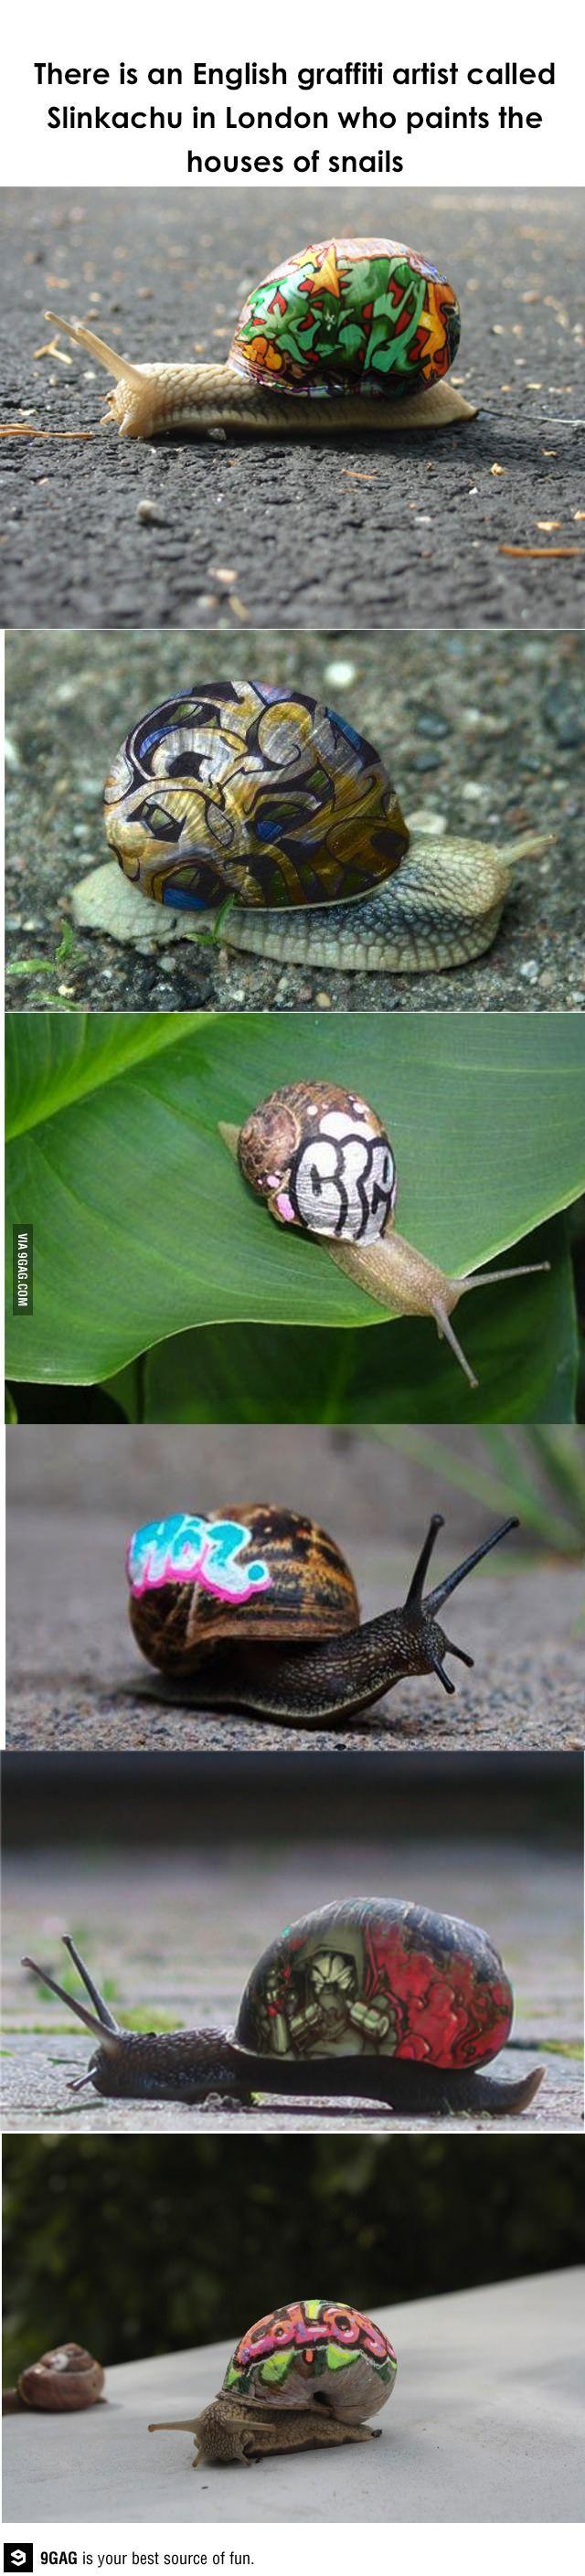 Snail graffiti